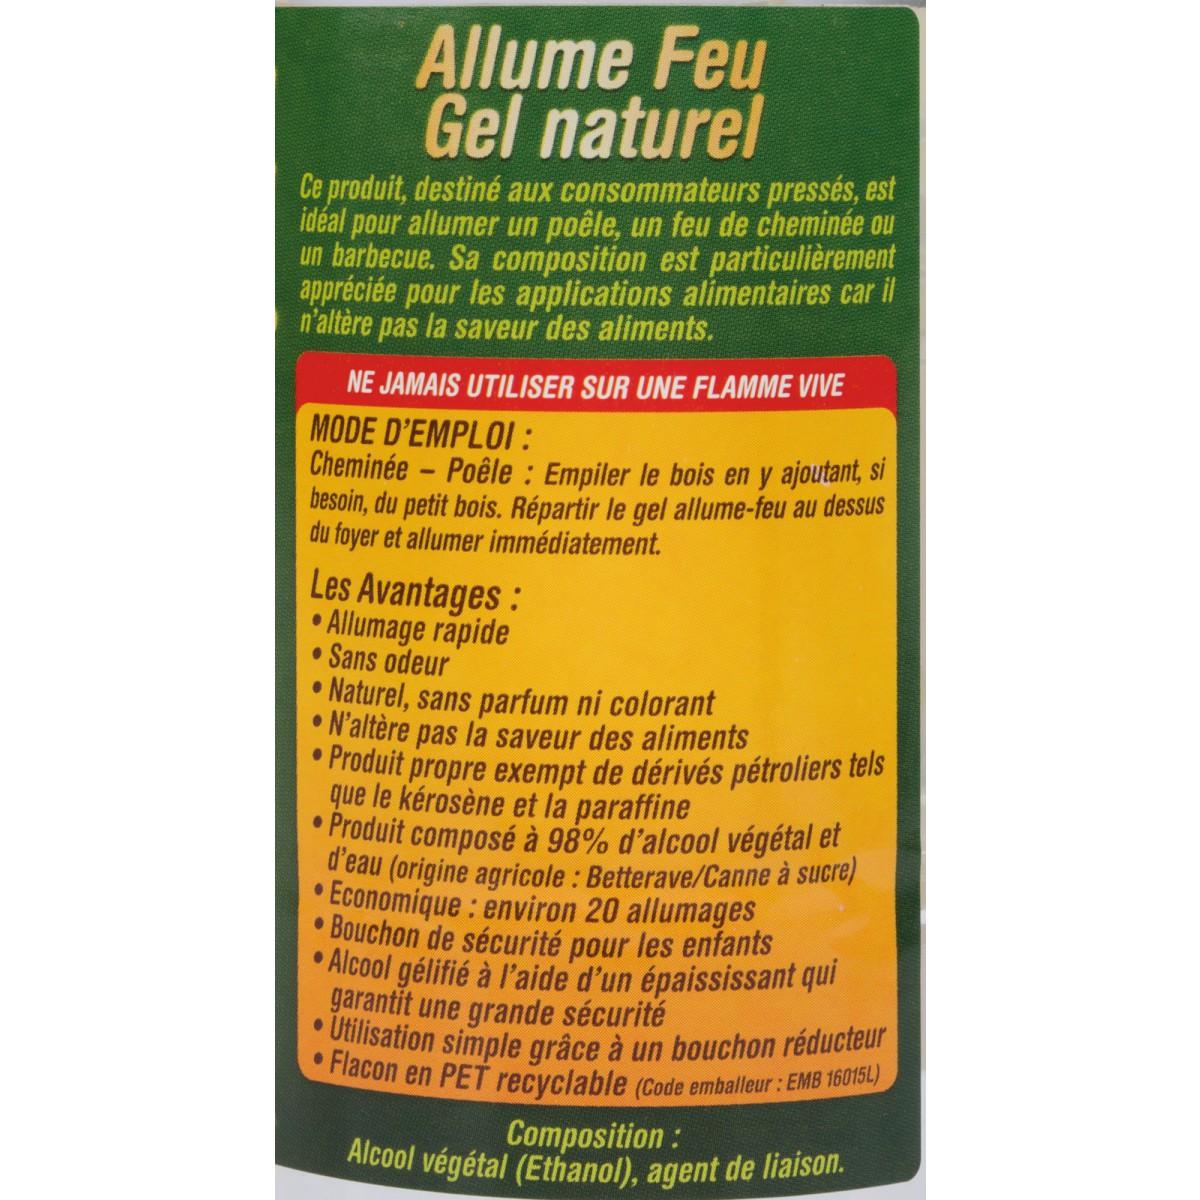 Allume Feu gel naturel d'origine végétale Feudor  - Flacon 1 l